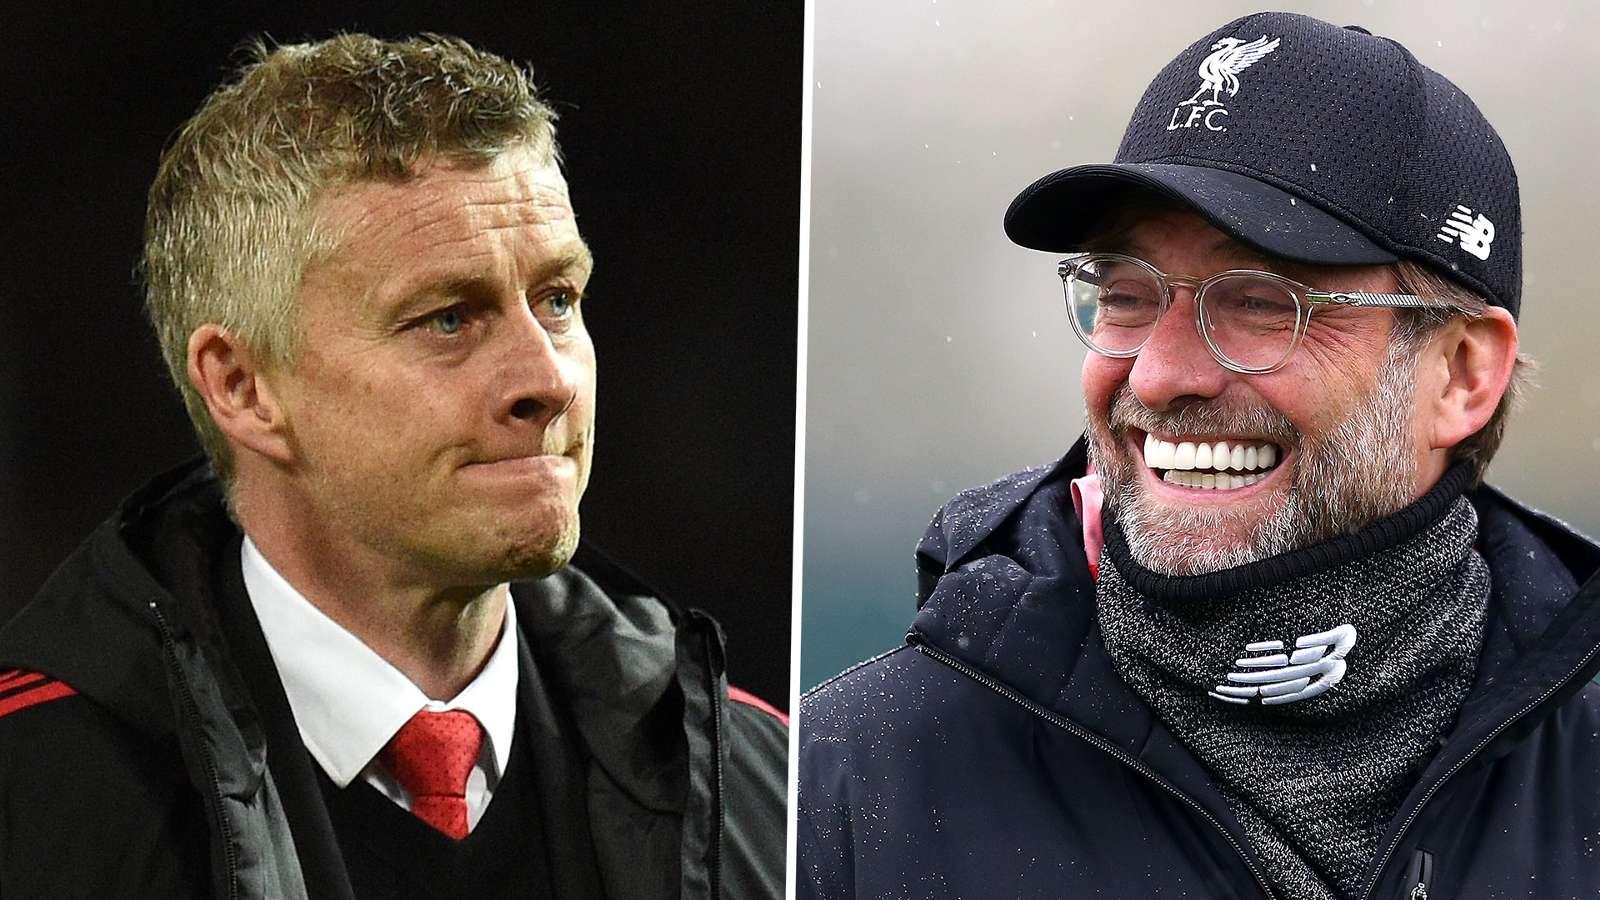 ole gunnar solskjaer jurgen klopp - Man Utd competing with Liverpool, says Solskjaer